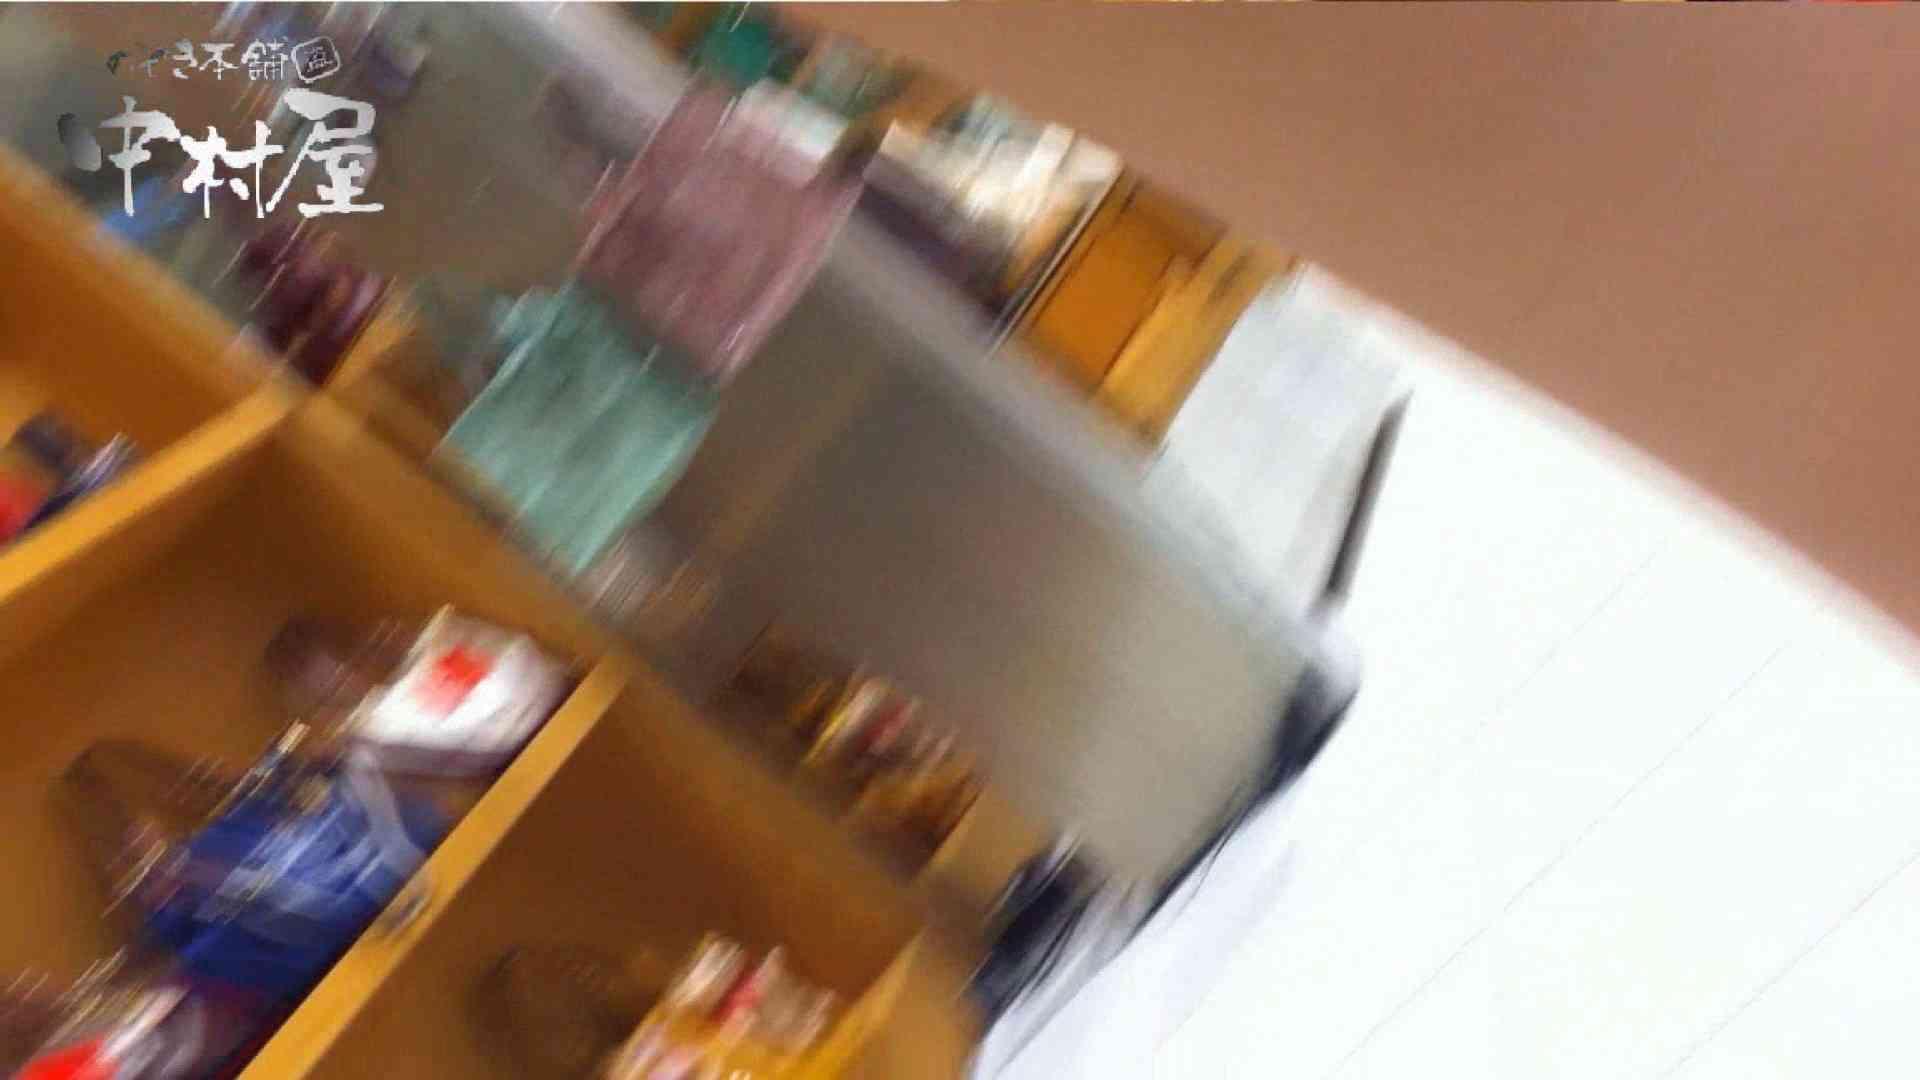 vol.48可愛いカリスマ店員胸チラ&パンチラ アニメ声の店員さん 胸チラ  96Pix 28